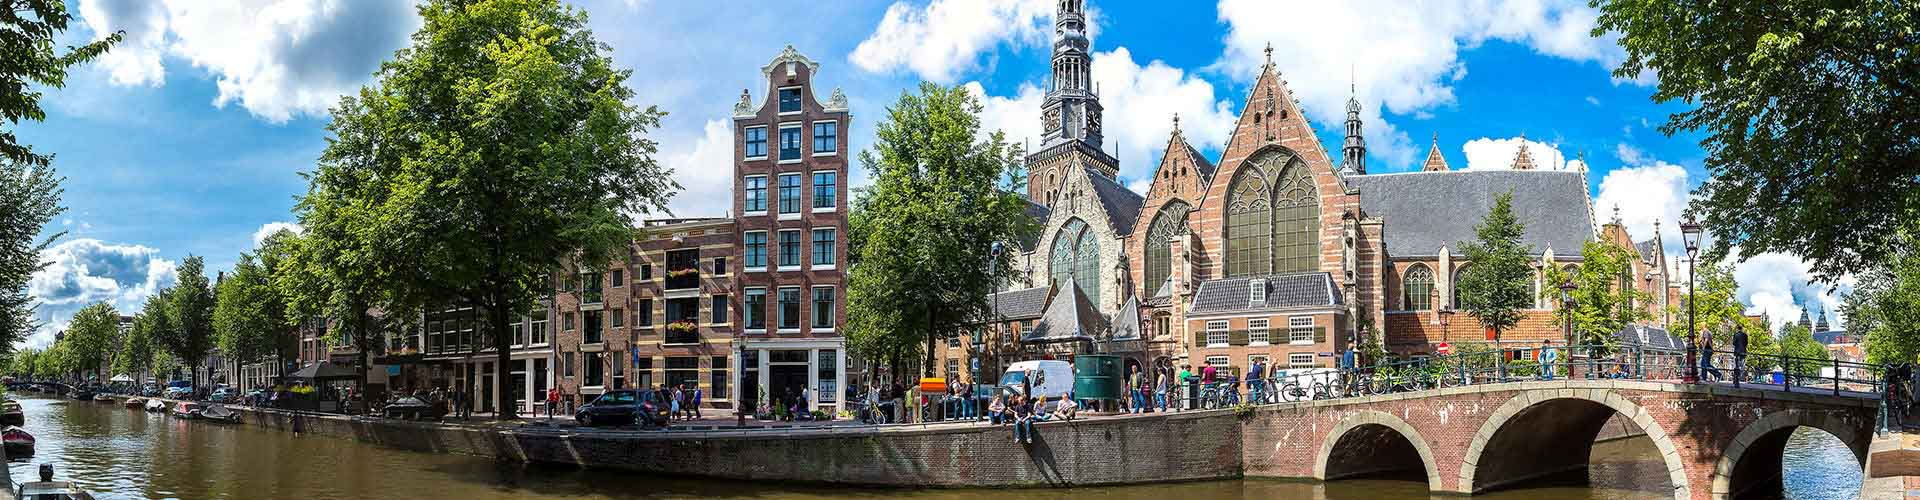 Amsterodam - Hostelů v blízkosti Oude Kerk. Mapy pro Amsterodam, fotky a recenze pro každý hostel v Amsterodam.